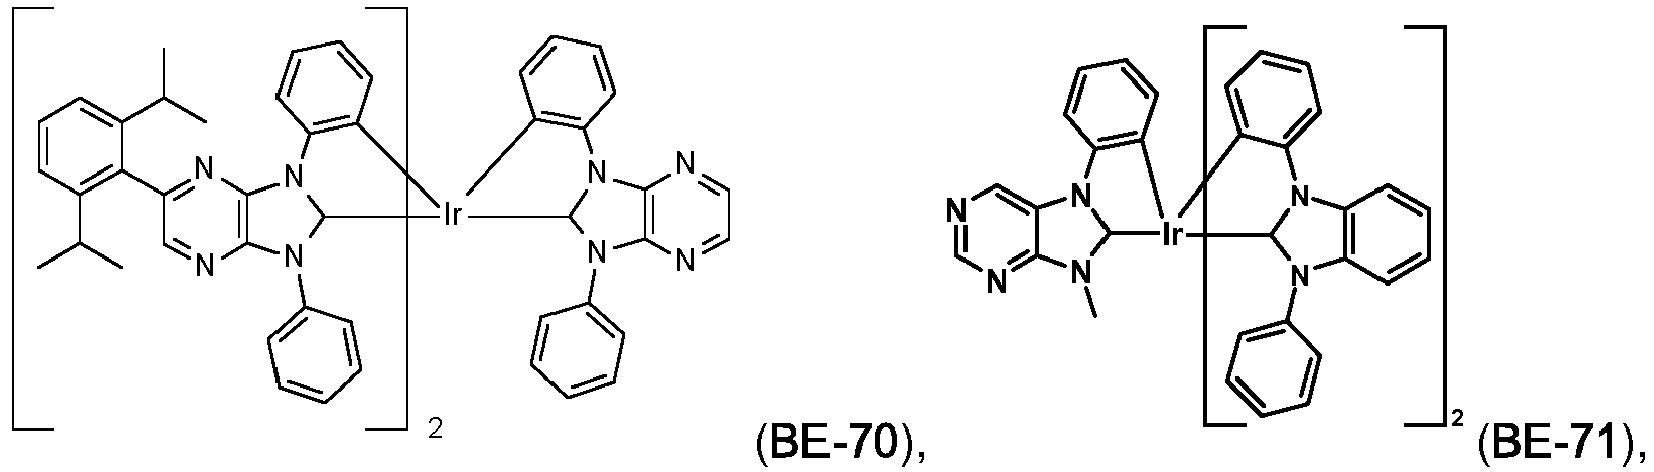 Figure imgb0781